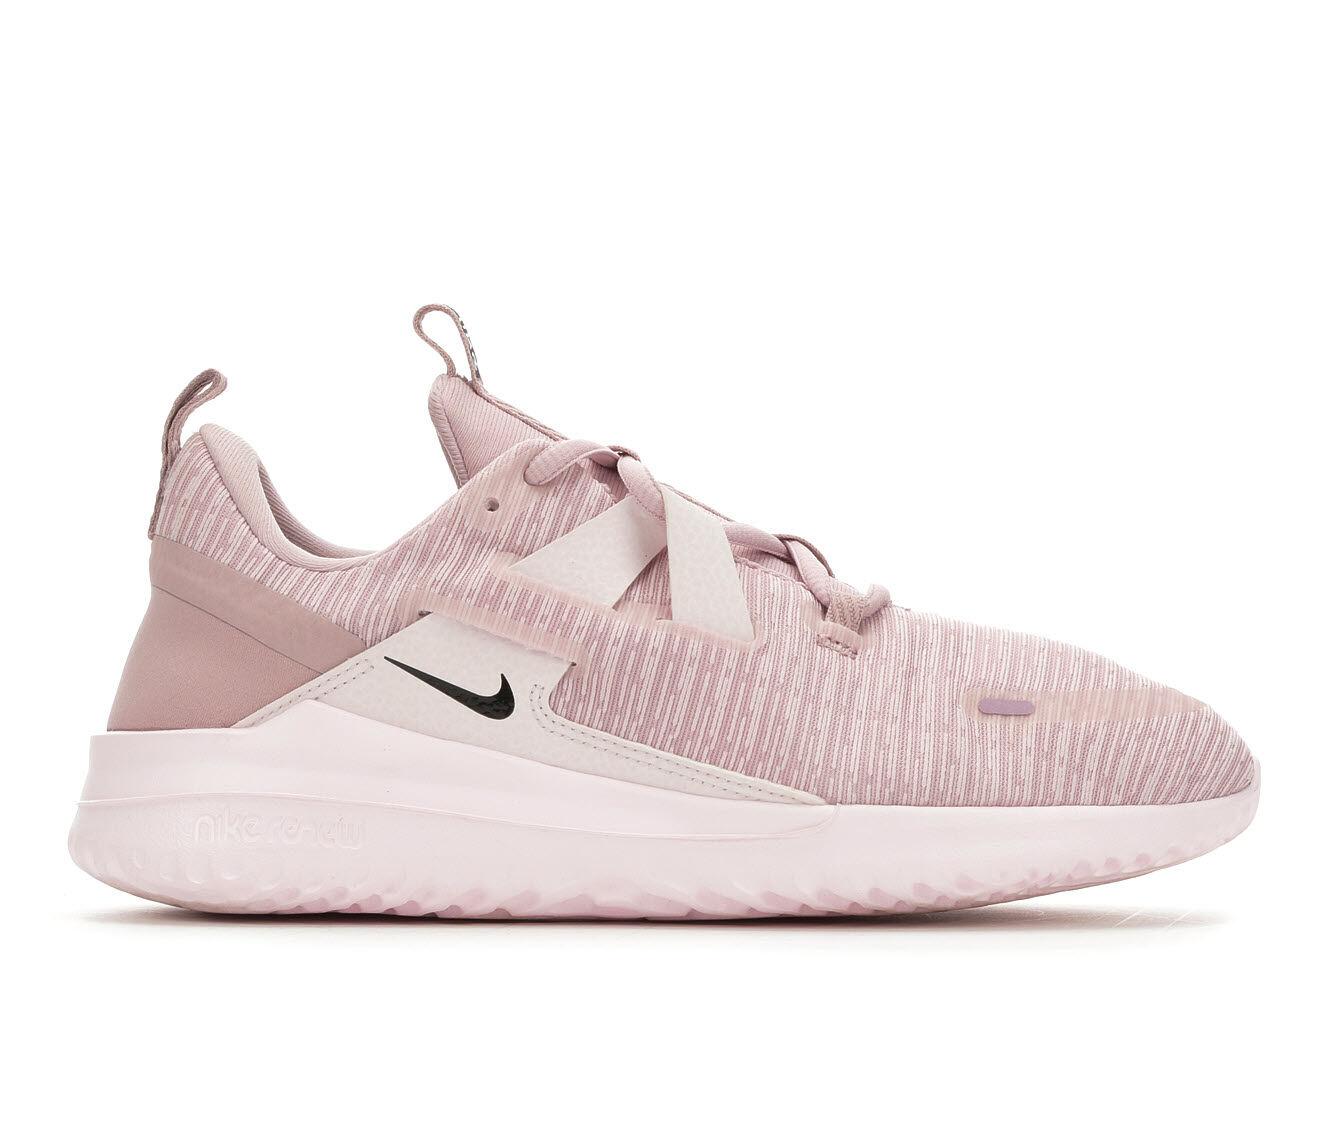 Women's Nike Renew Arena Running Shoes Plum/Black/Pink